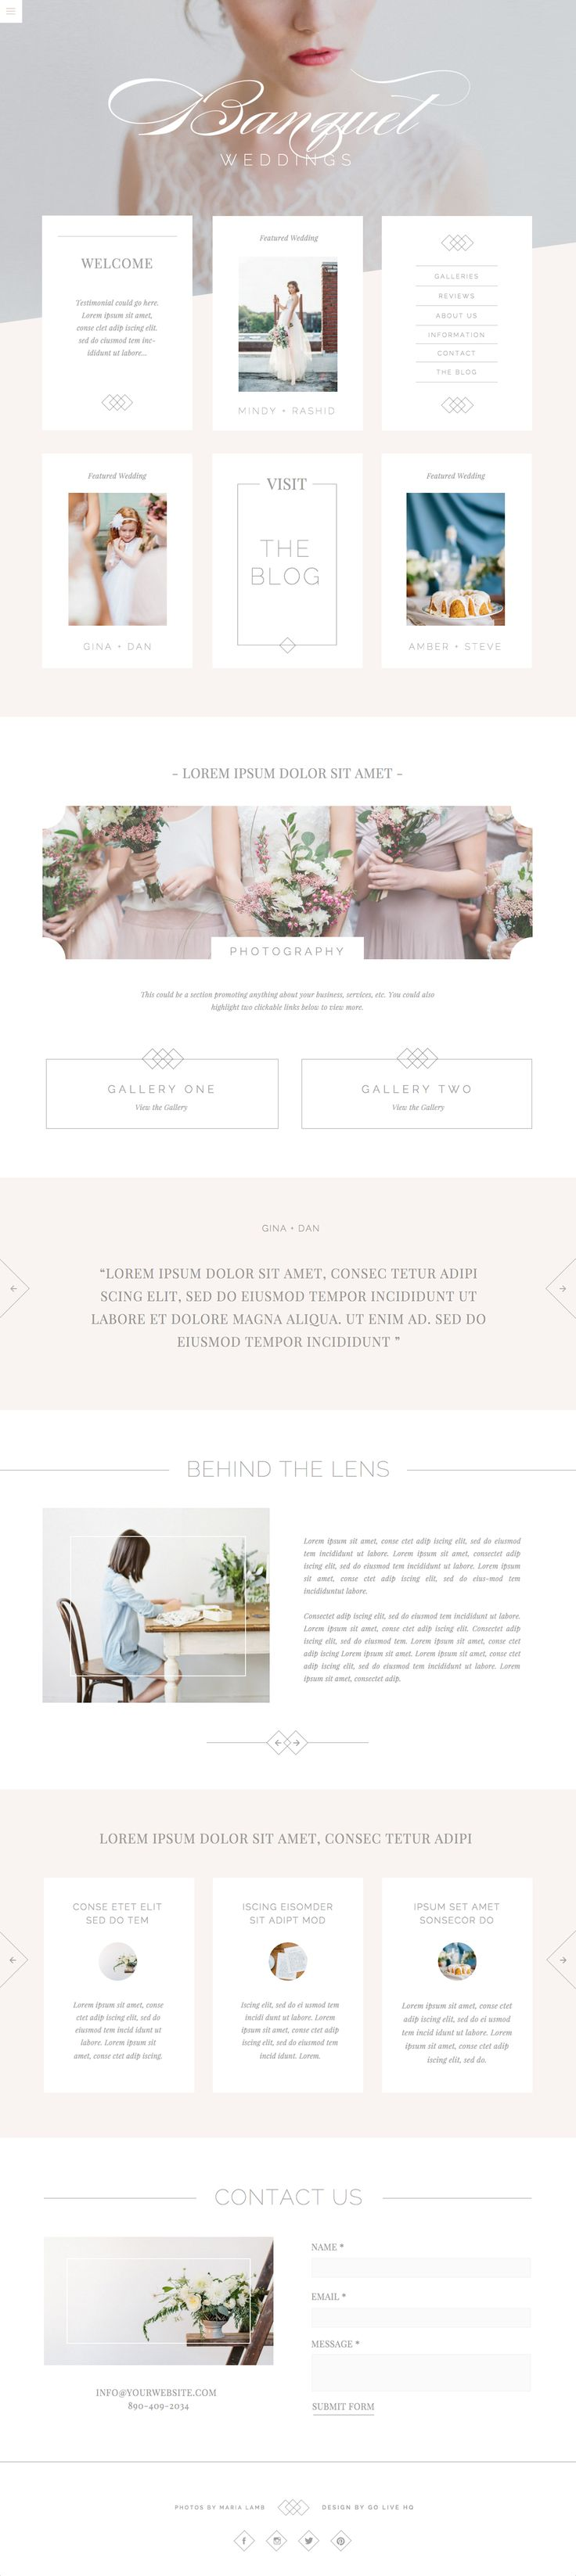 51 best Website Themes Designs images on Pinterest